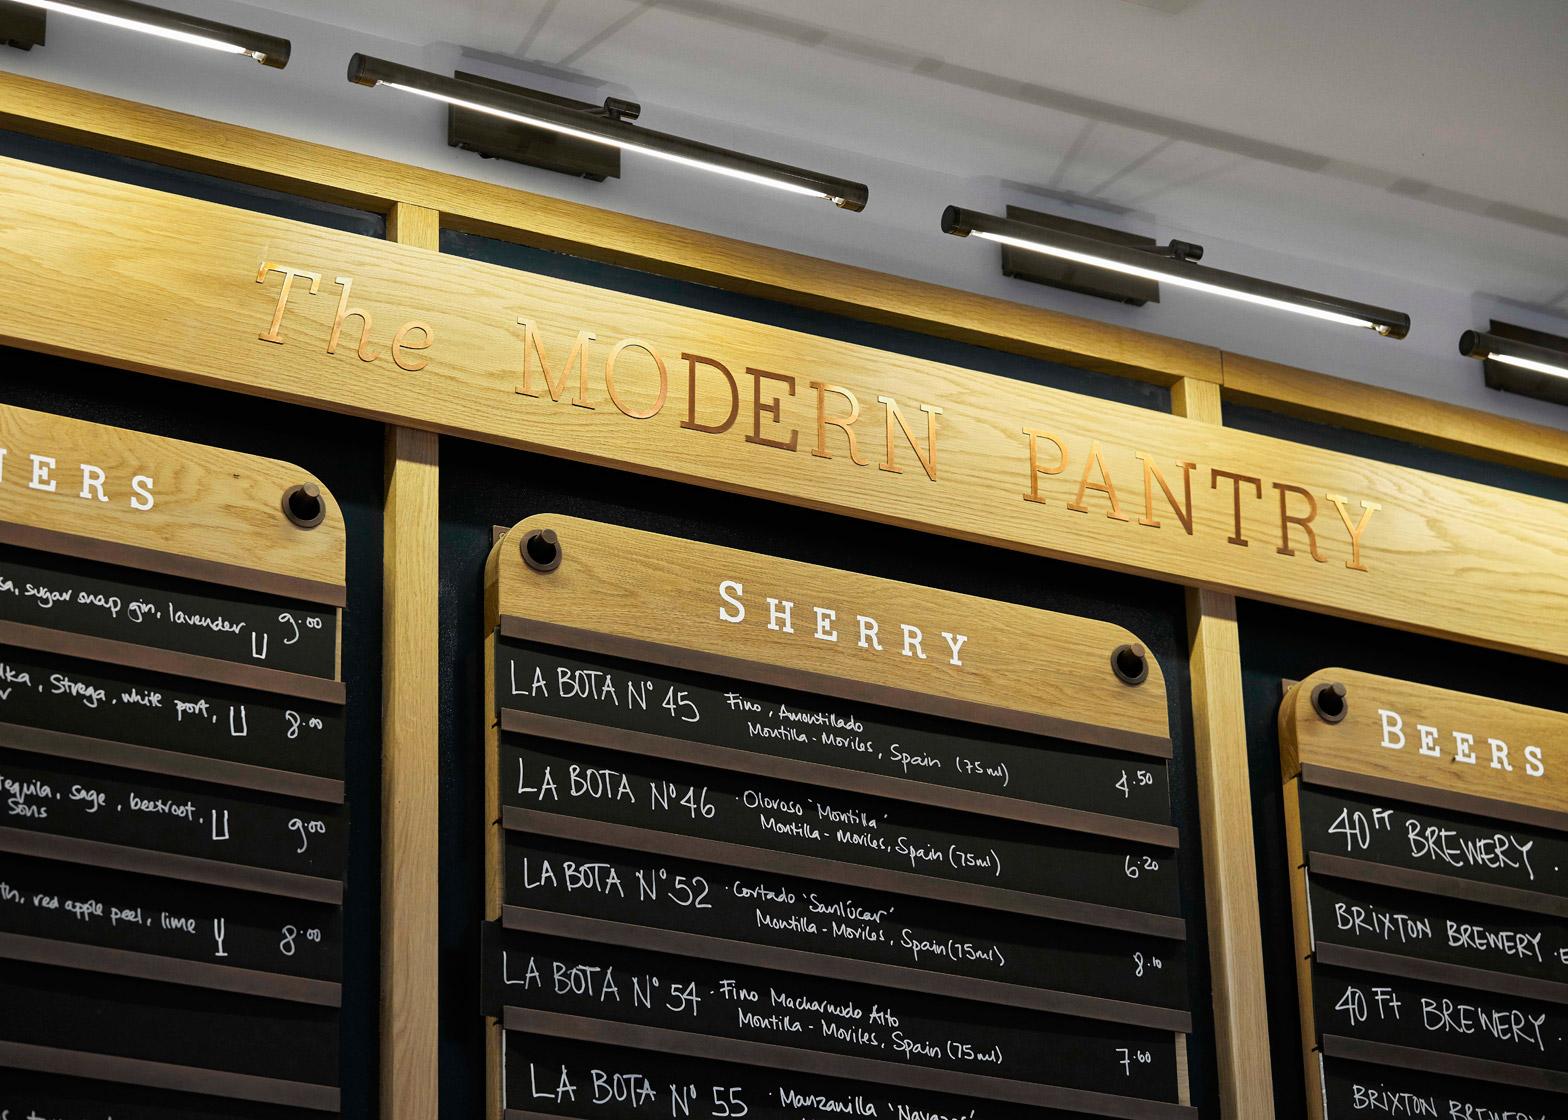 modern-pantry-avroko-restaurant-bar-interior-furniture-lighting-london-uk_dezeen_1568_3